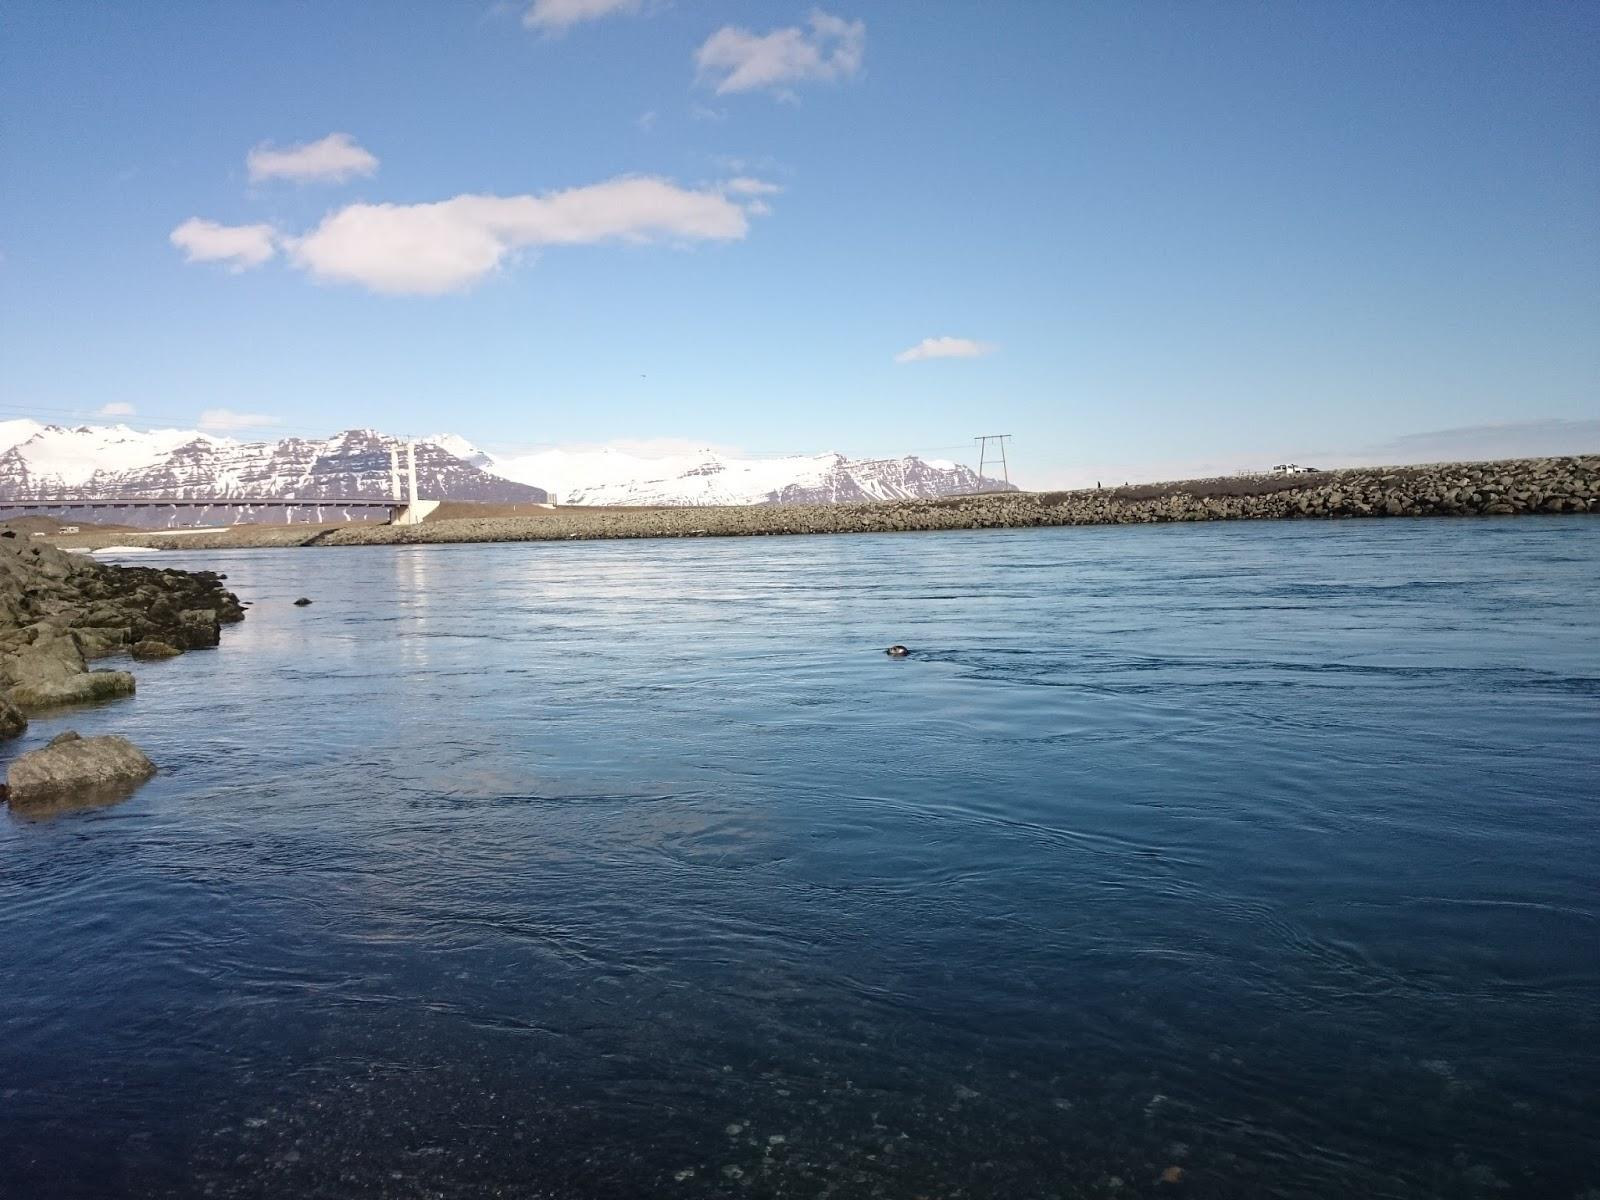 foka, Jokulsa, rzeka, islandzka rzeka, Laguna Lodowcowa, Islandia, Ice Lagoon, Jokulsarlon, lodowiec, panidorcia, blog o Islandii